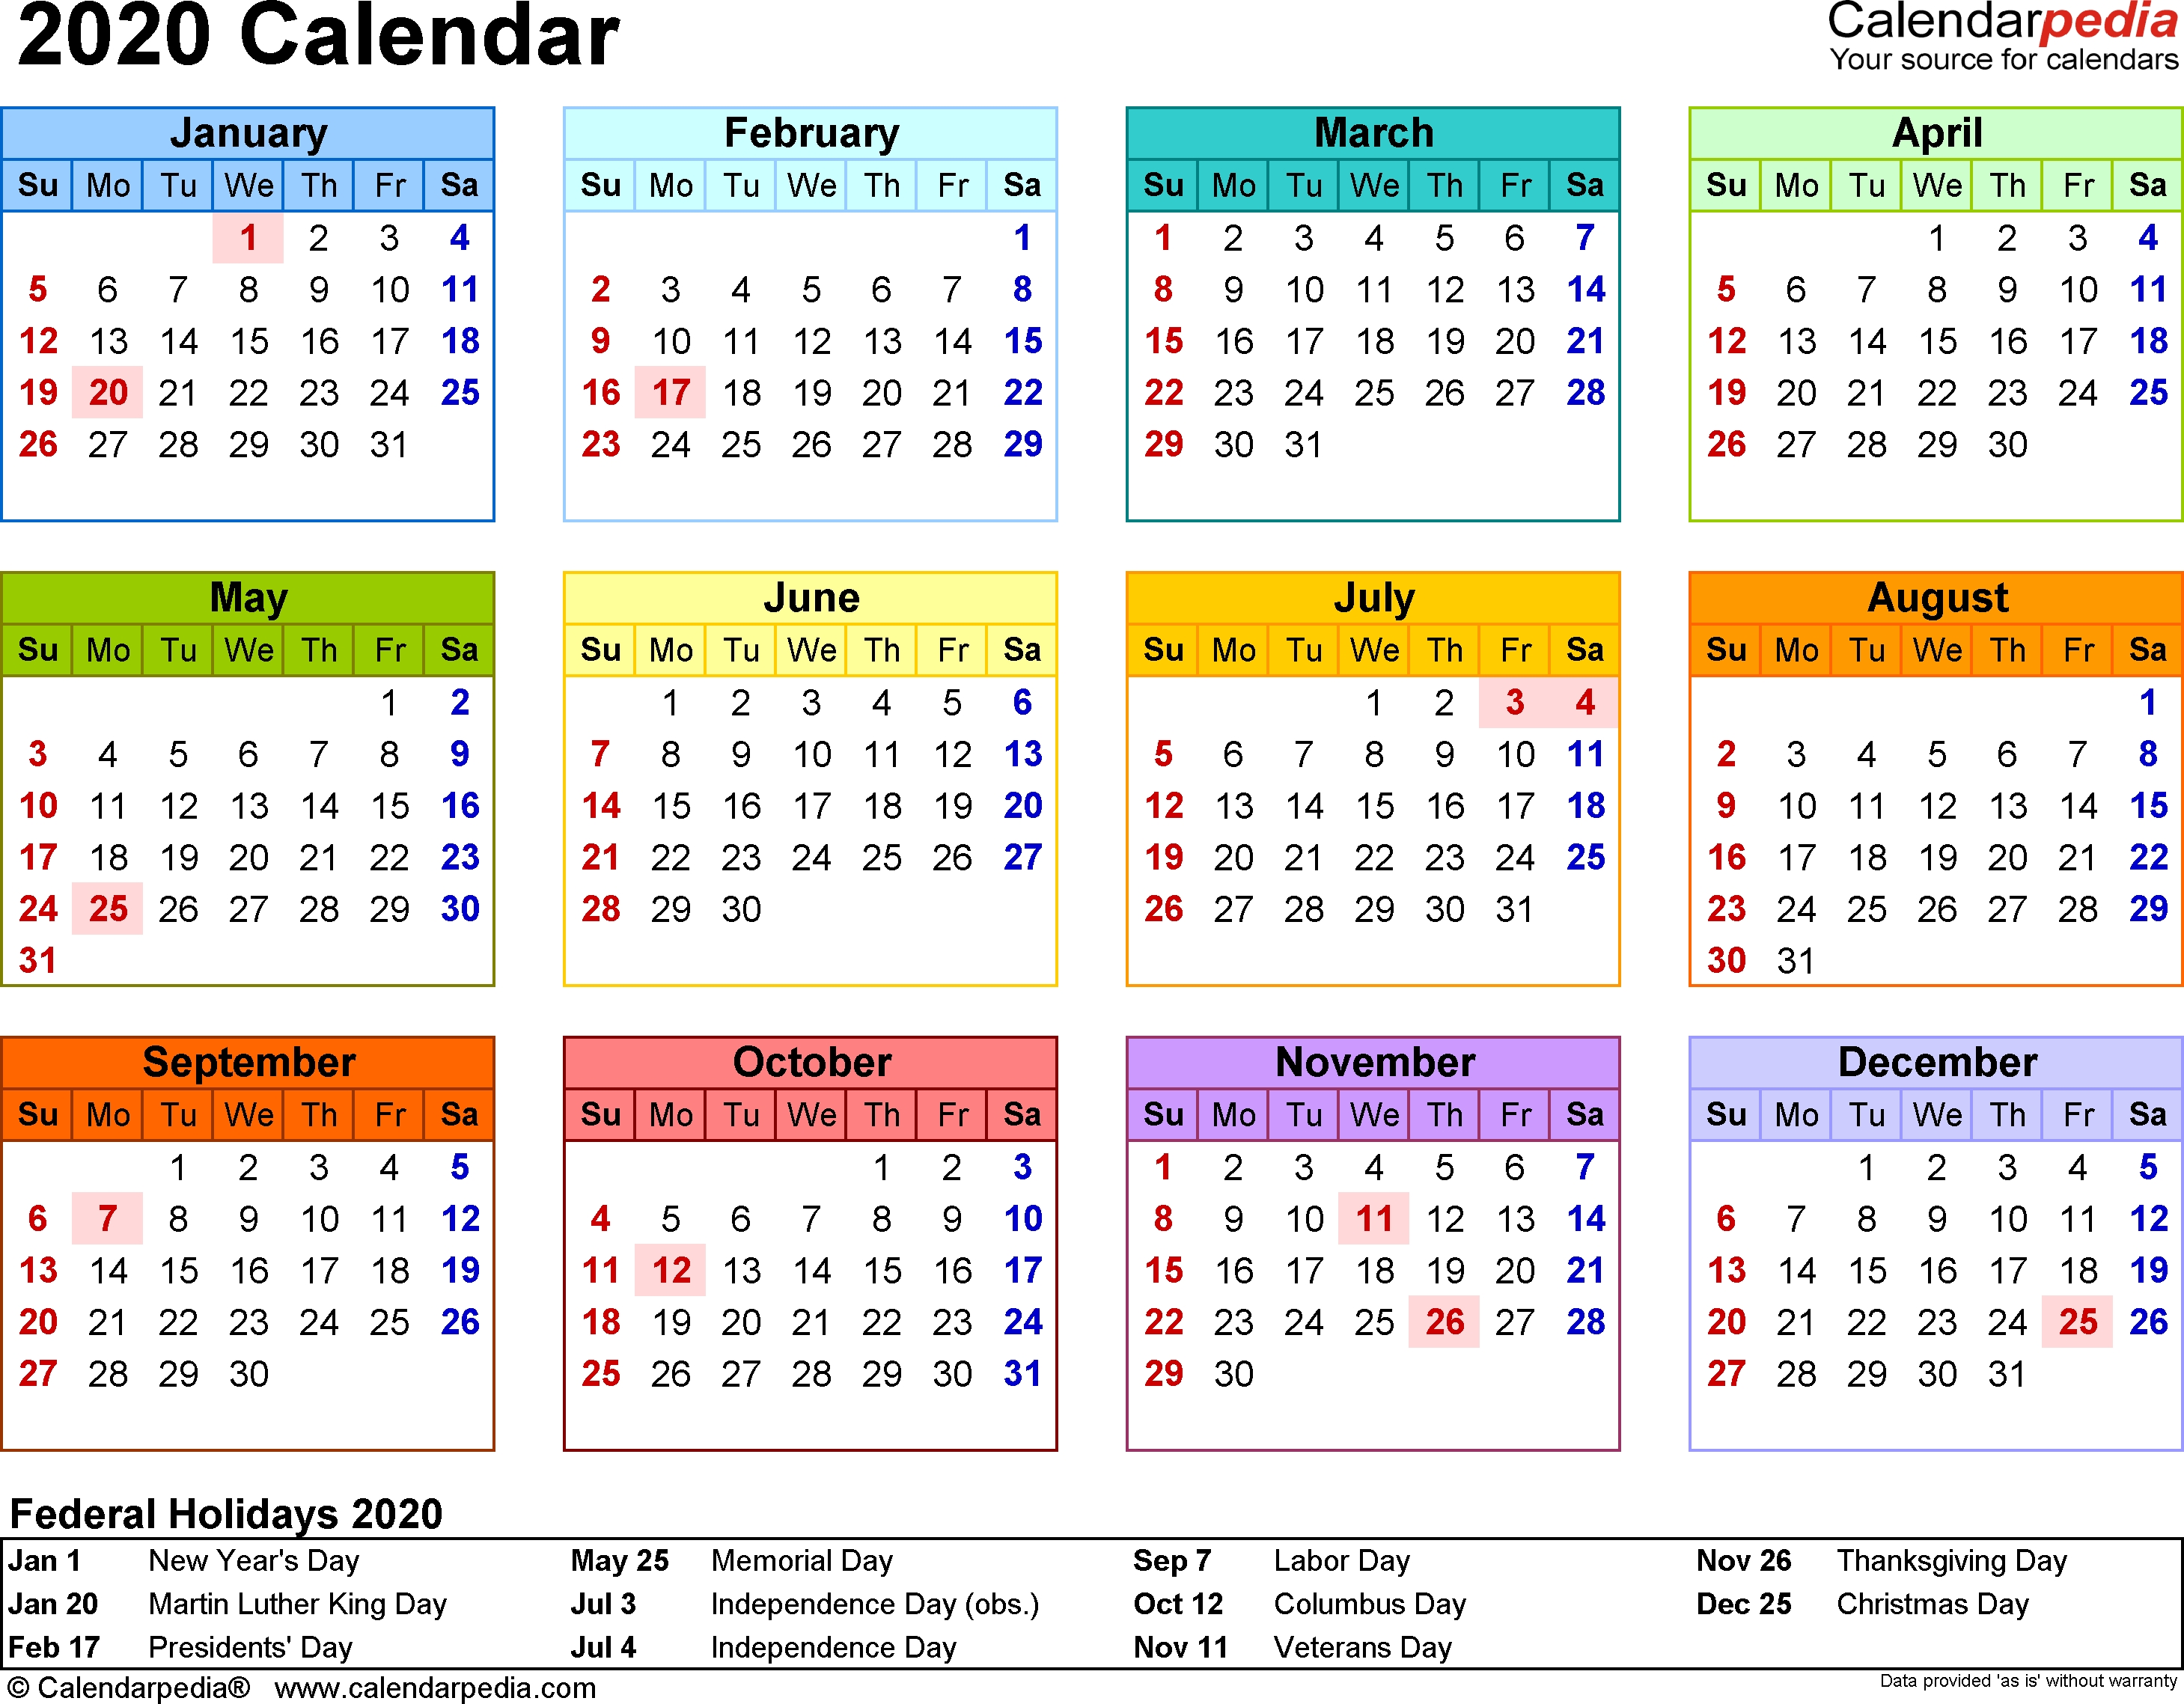 2020 Calendar - Download 17 Free Printable Excel Templates (.xlsx)_2020 Calendar Blank Excel